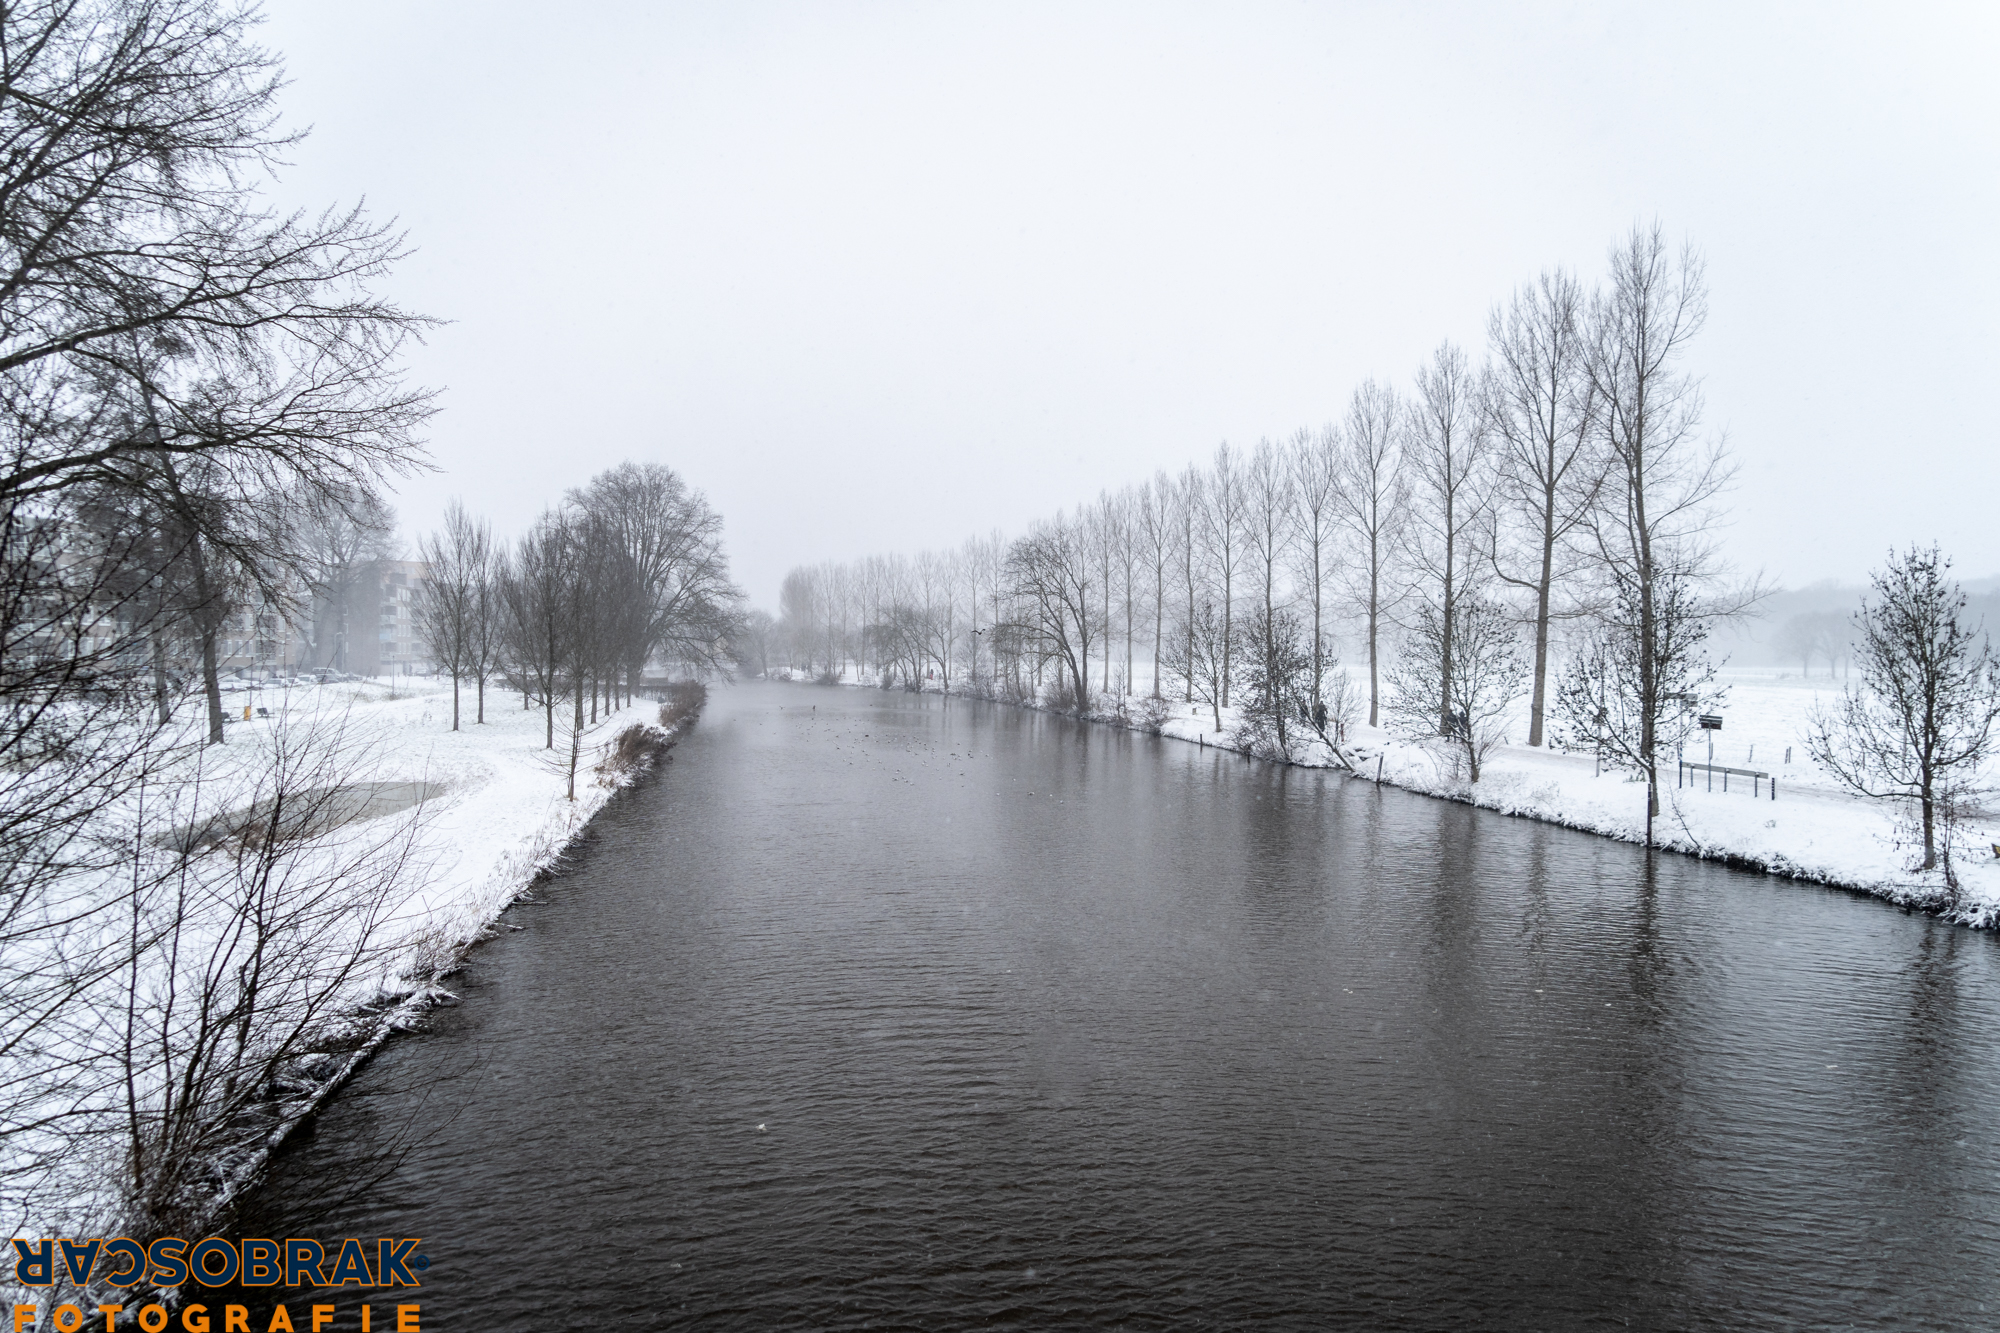 winter nederland utrecht oscar brak fotografie